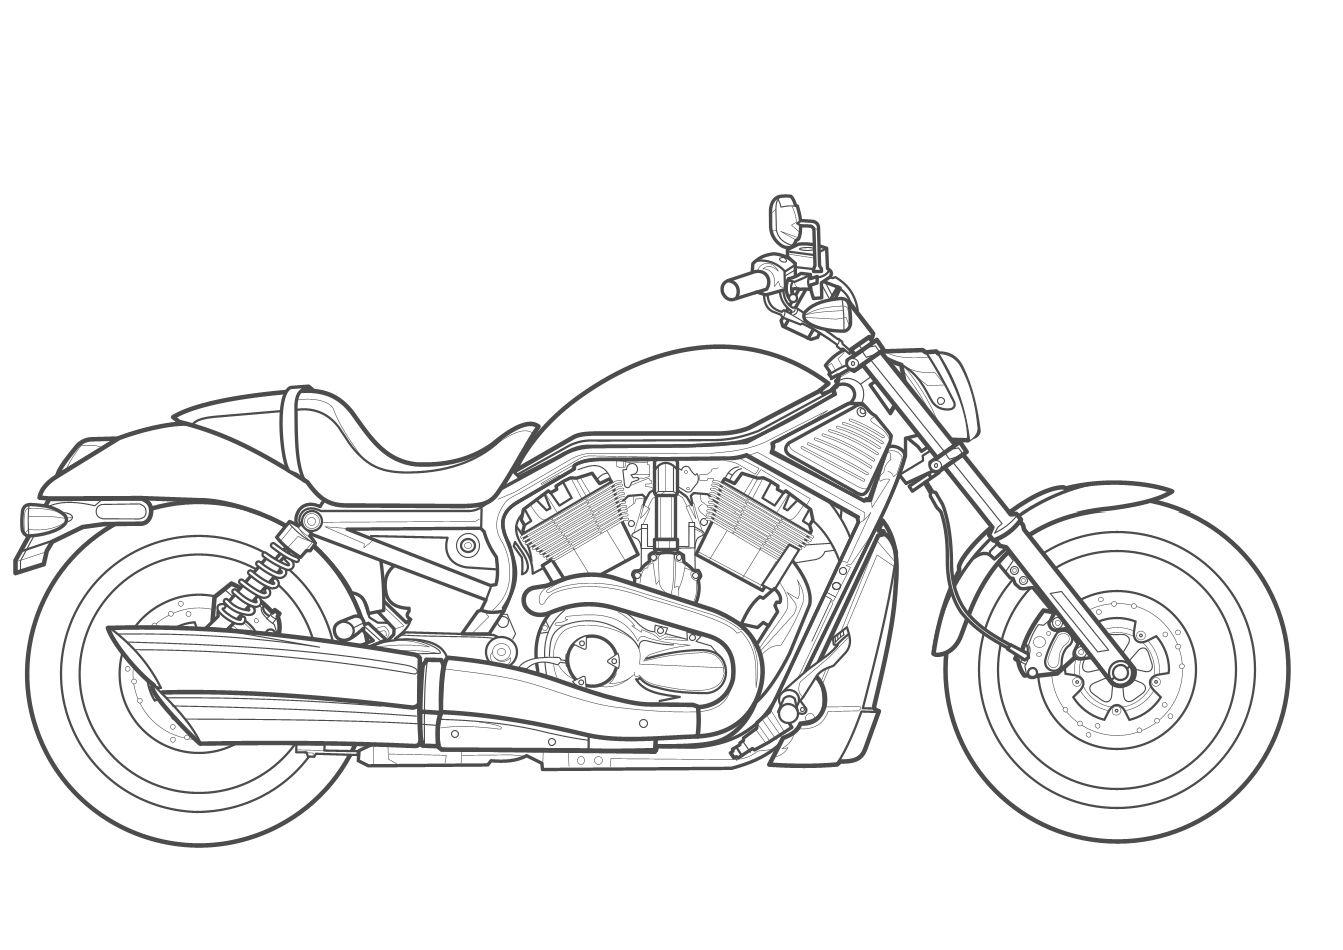 Harley Davidson S 100th Anniversary Bike